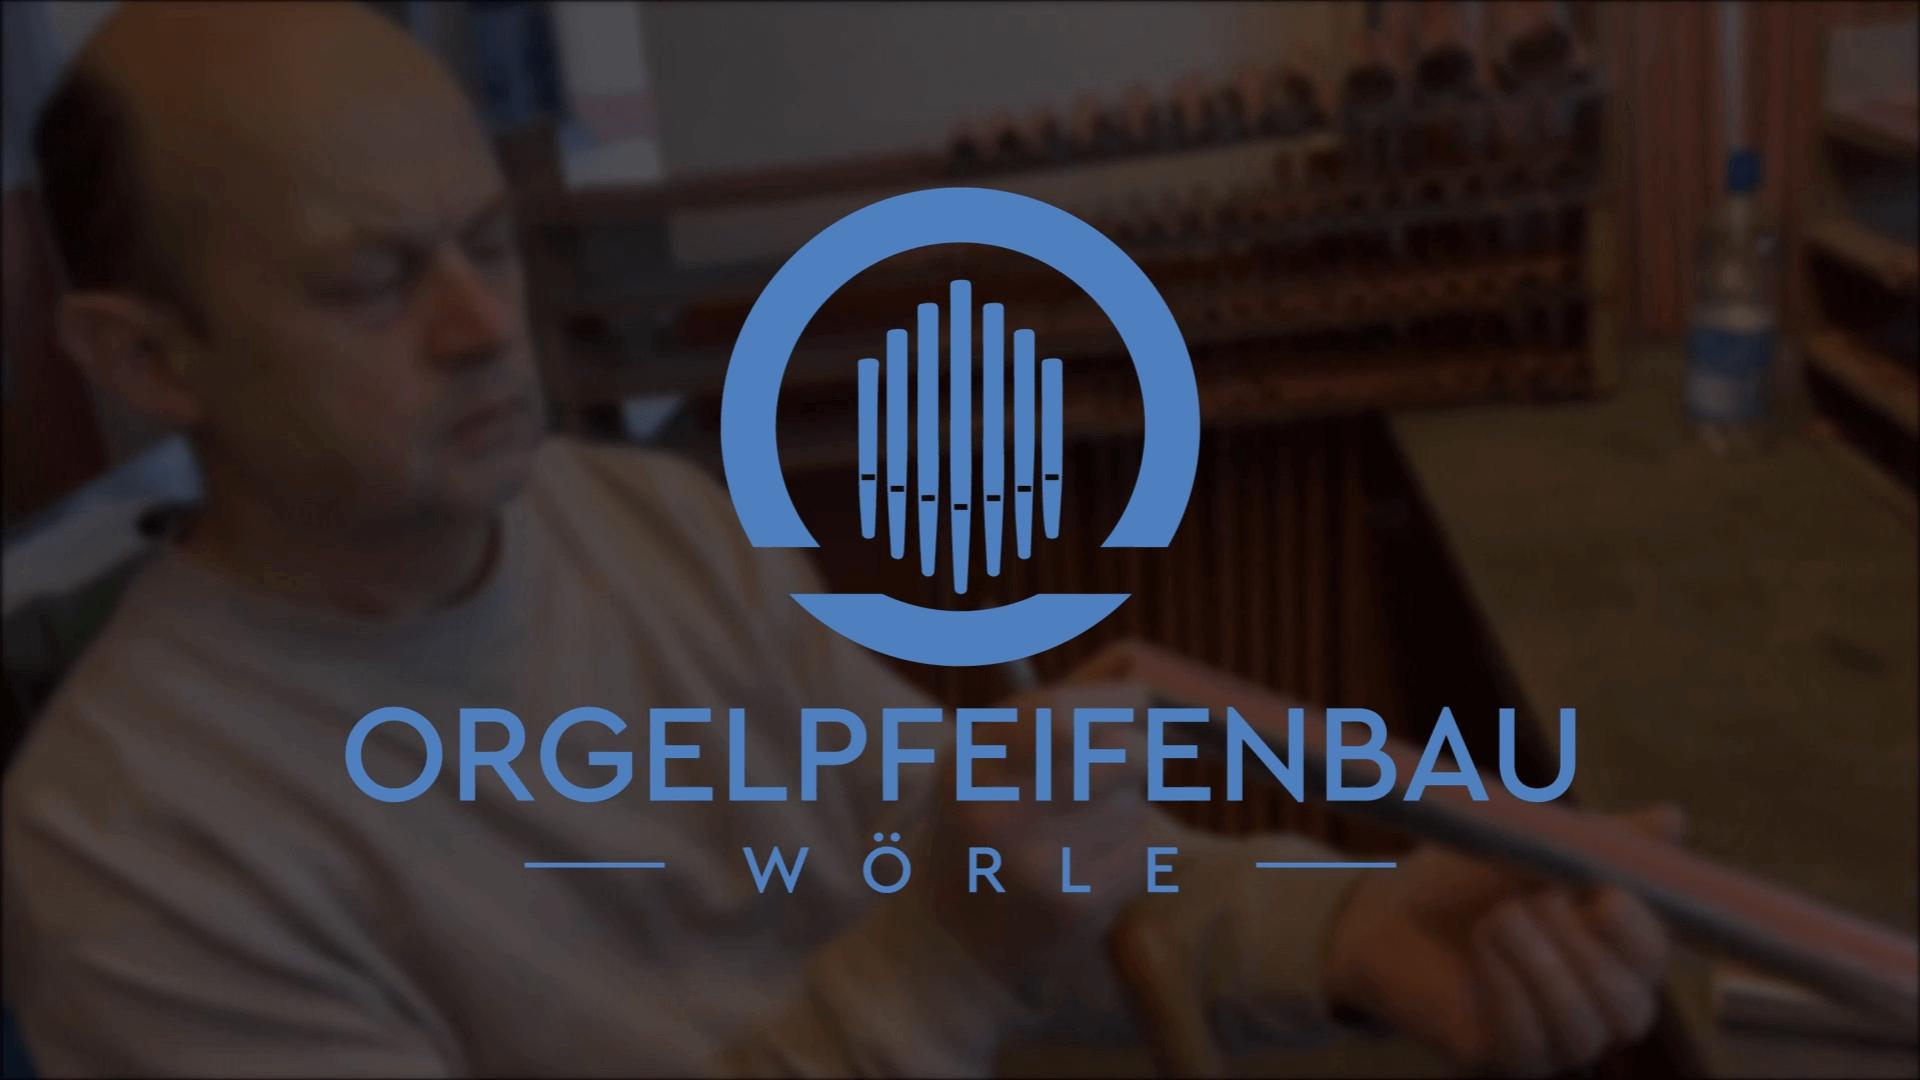 Orgelpfeifenbau Wörle